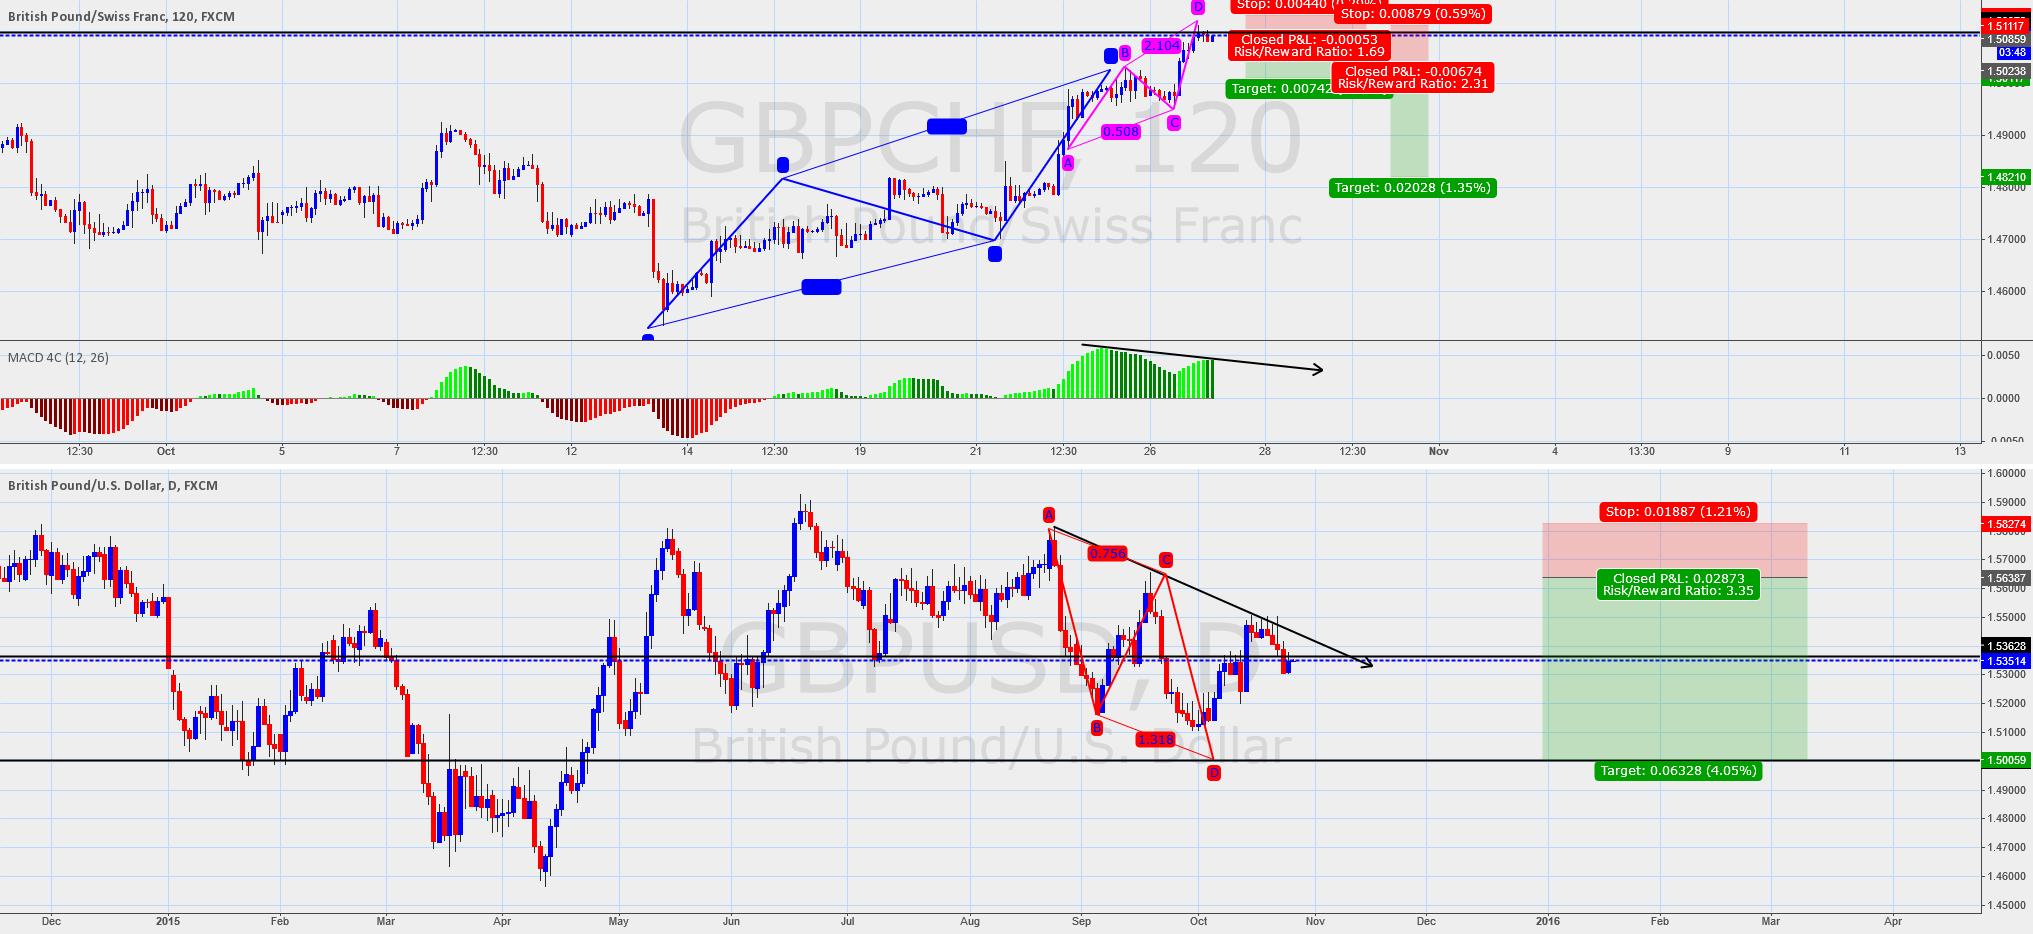 gbpchf bearish divergence